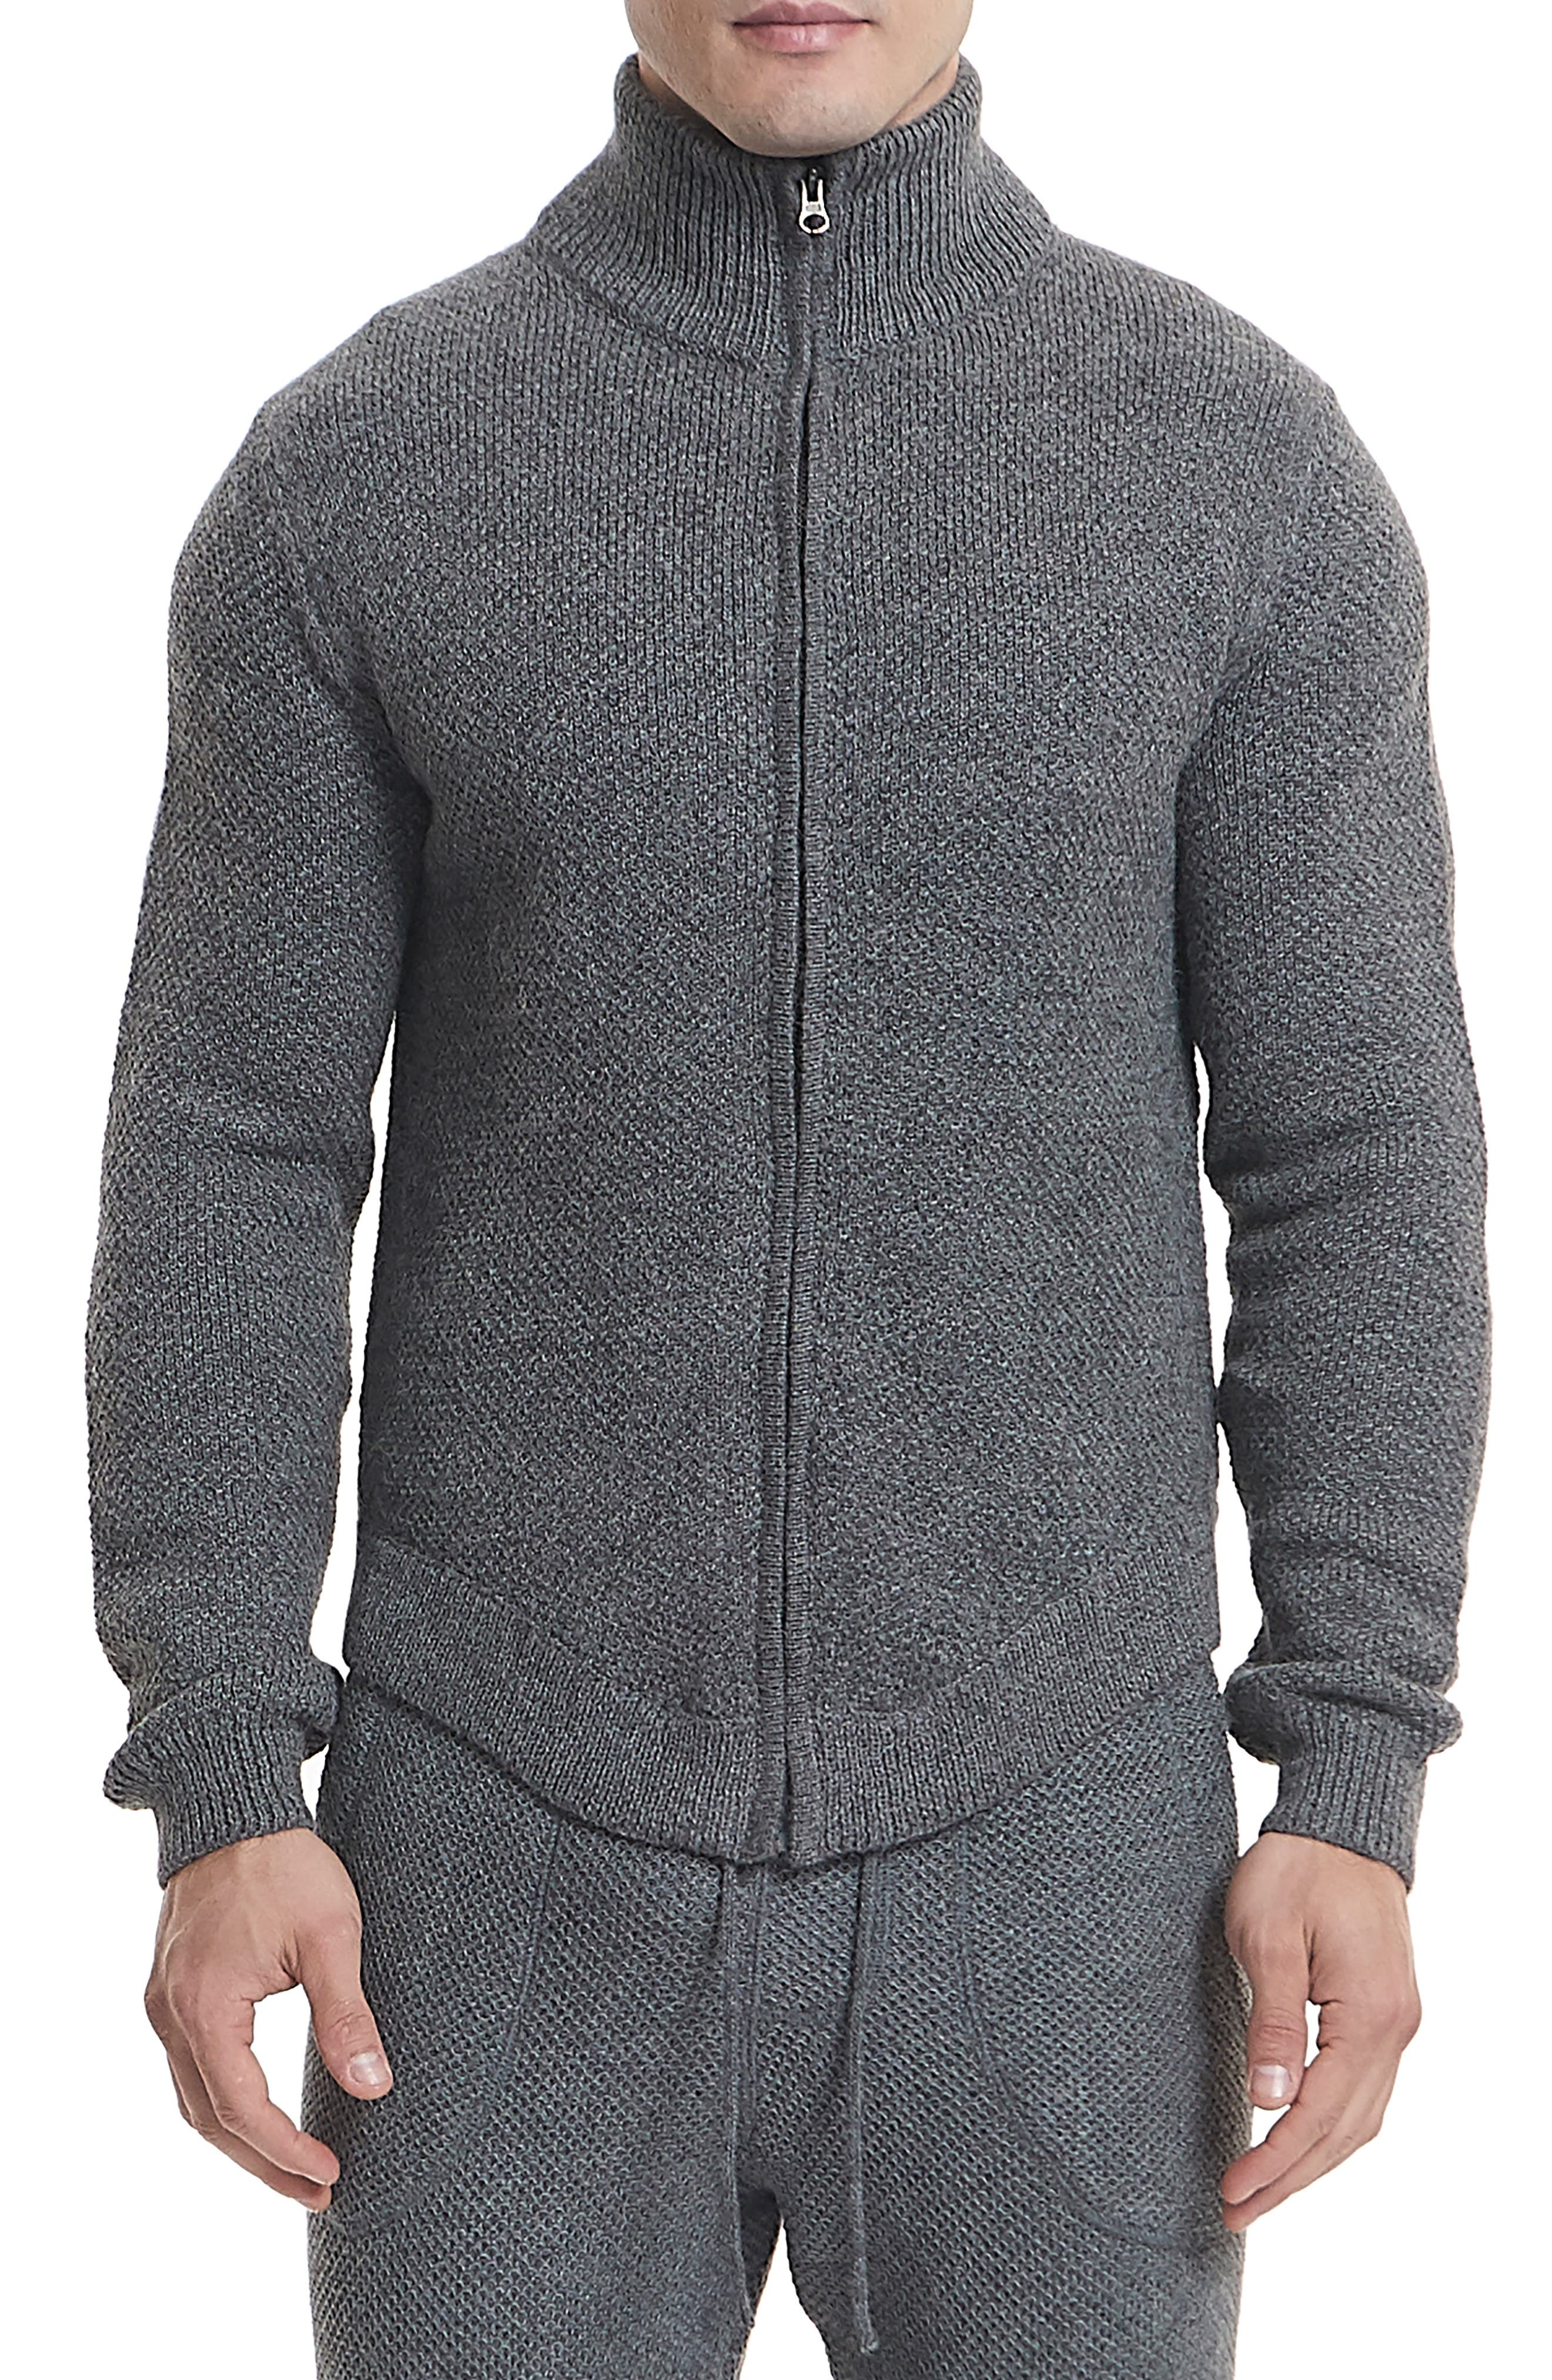 Goodlife Slim Fit Zip Cardigan, Grey